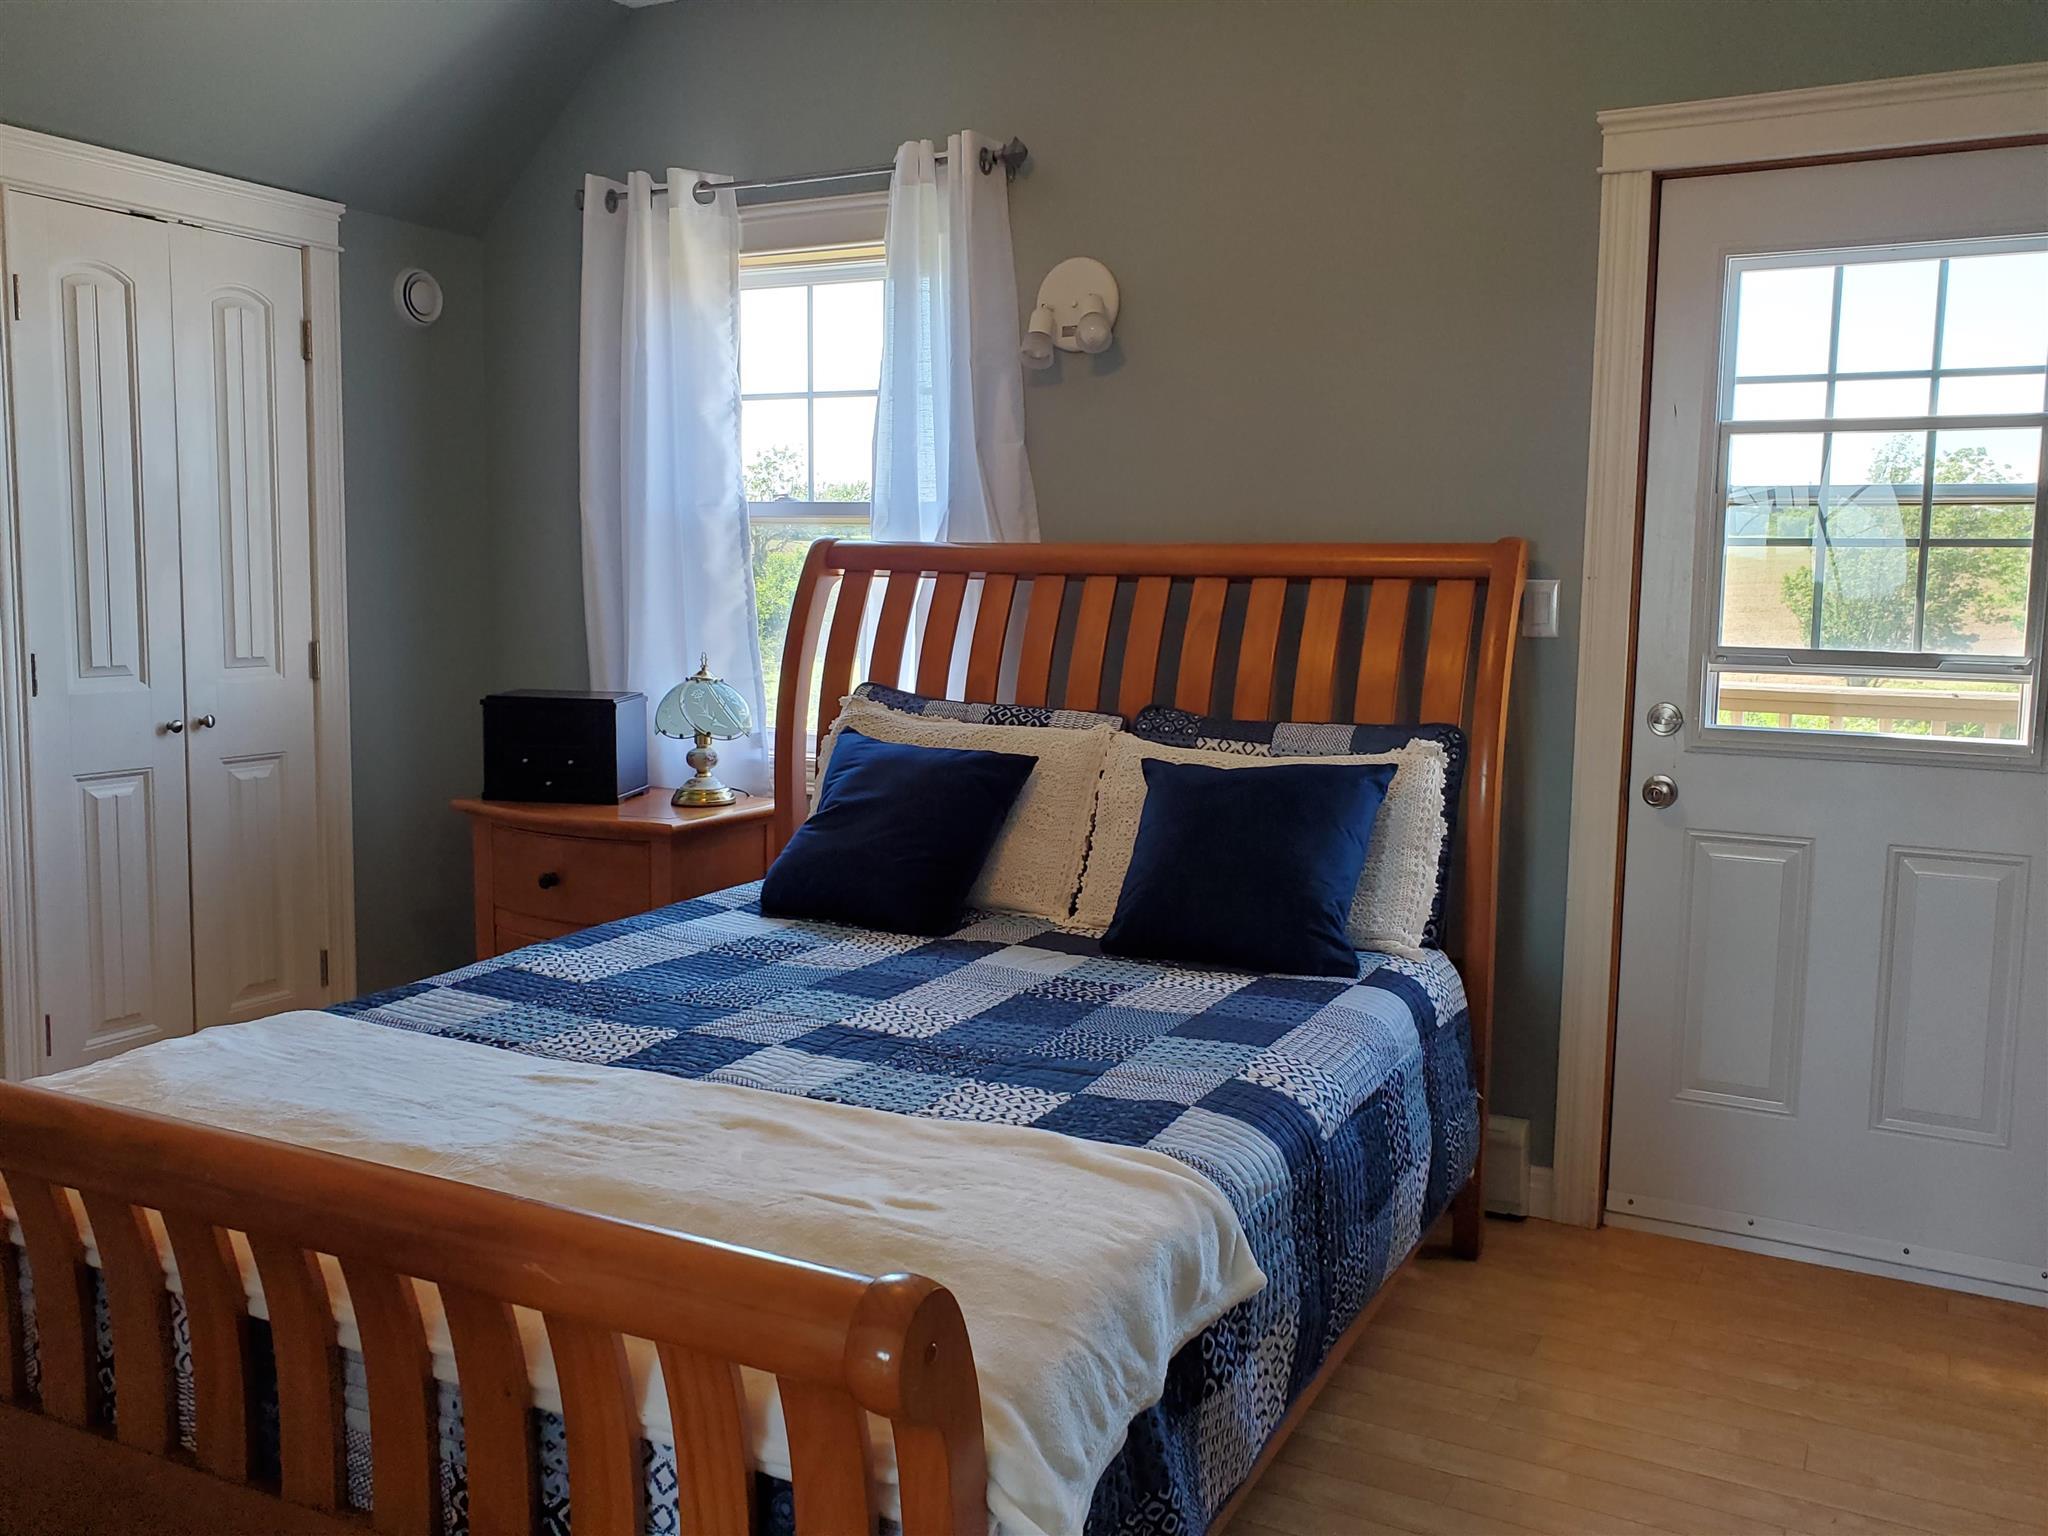 793 Millboro Road, Wheatley River, Prince Edward Island, Canada